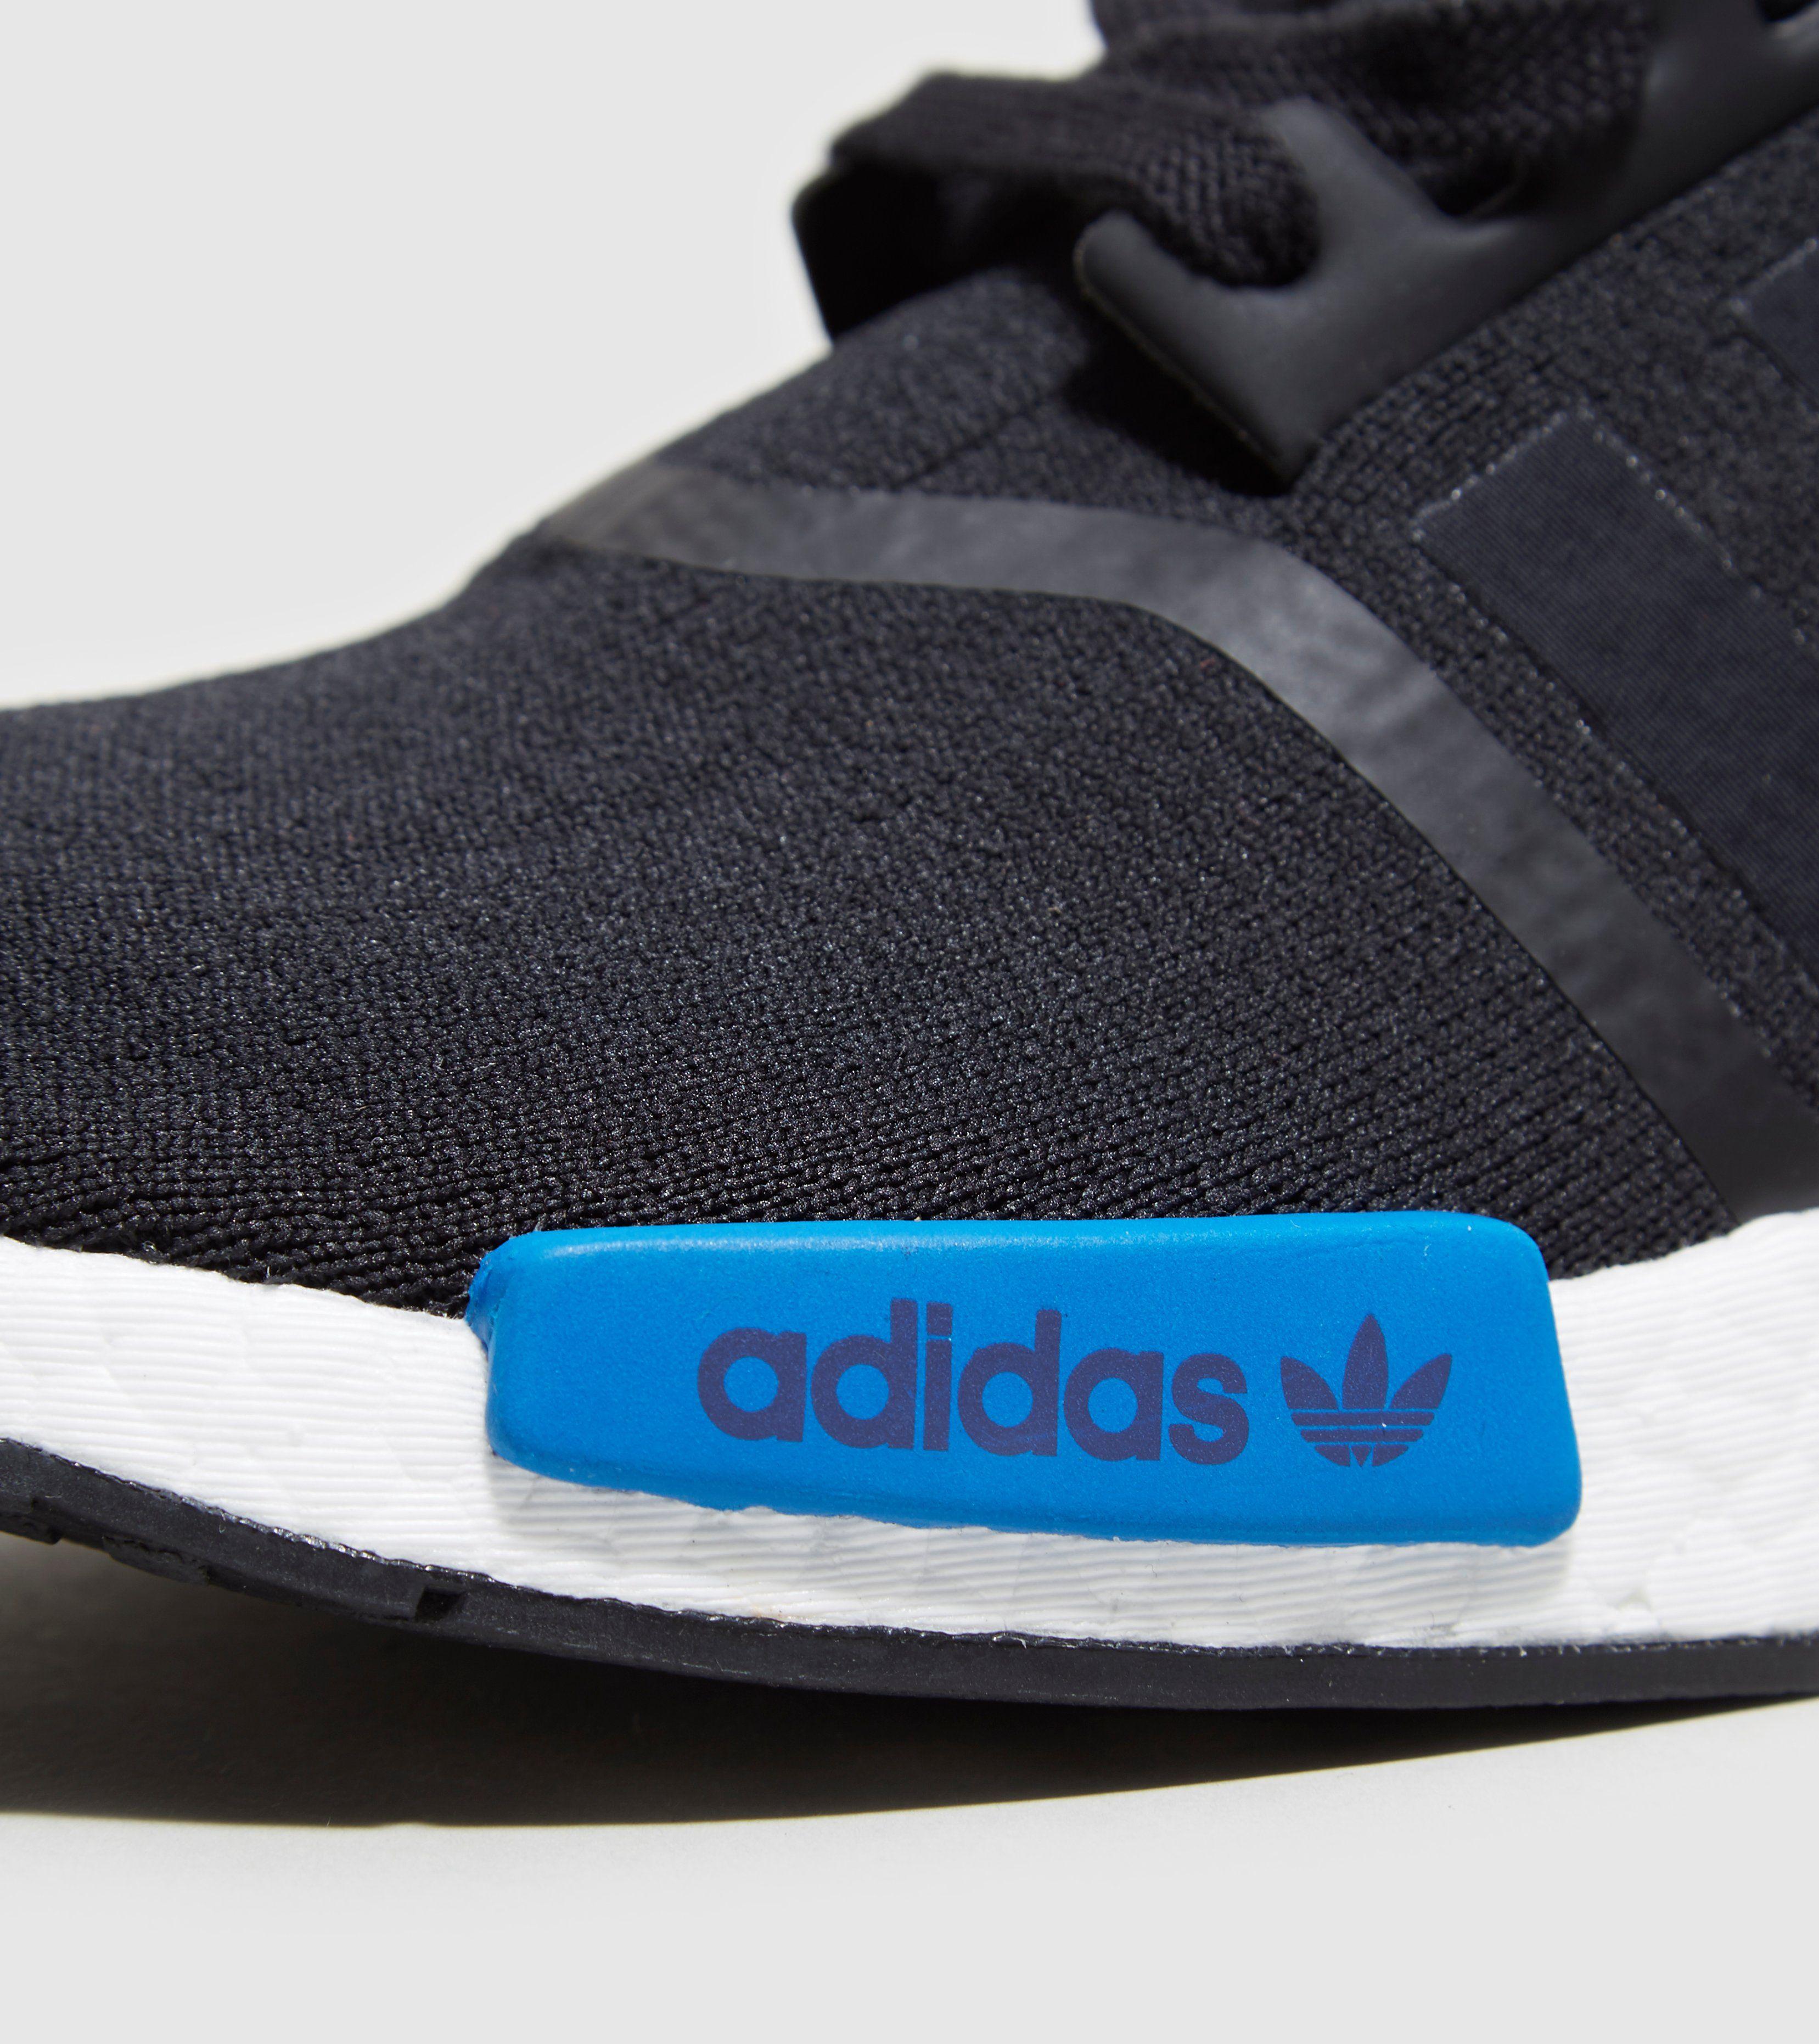 adidas nmd r 1 pk nomade runner primeknit